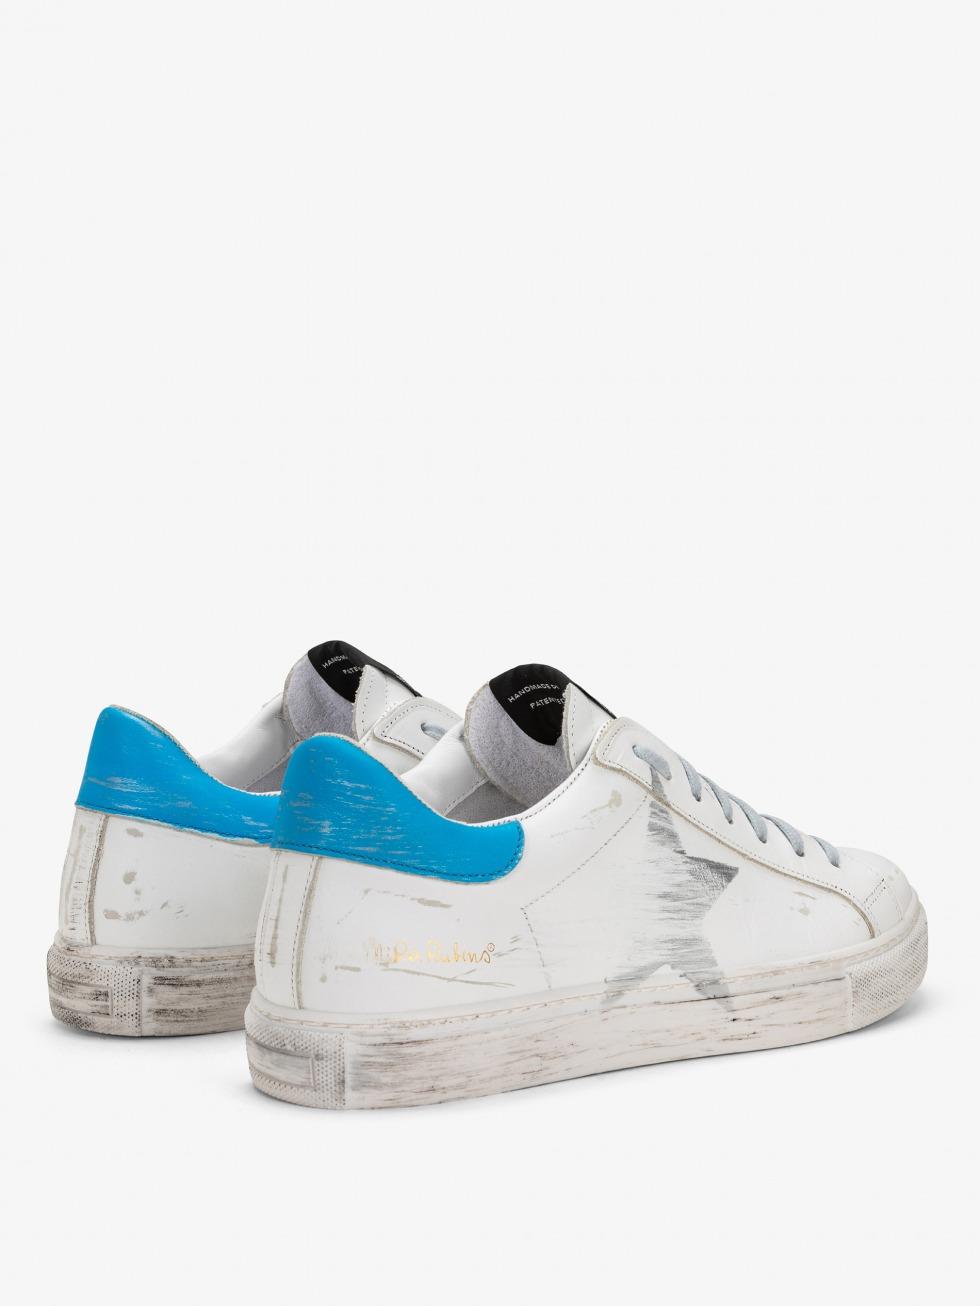 Martini M Sneakers - Star Vintage Scuba